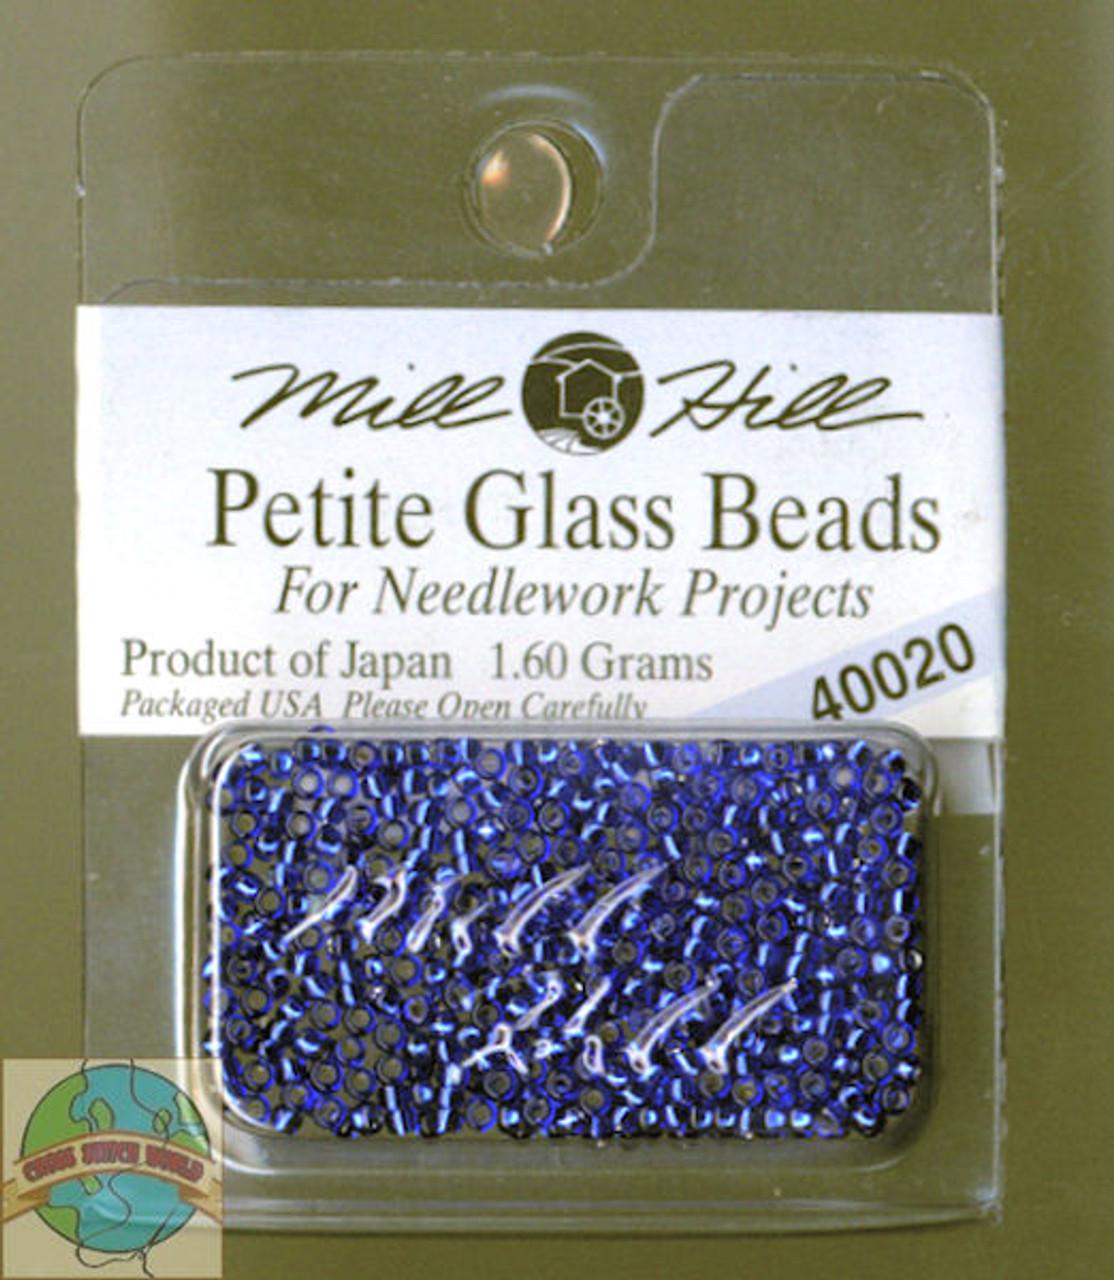 Mill Hill Petite Glass Beads 1.60g Royal Blue